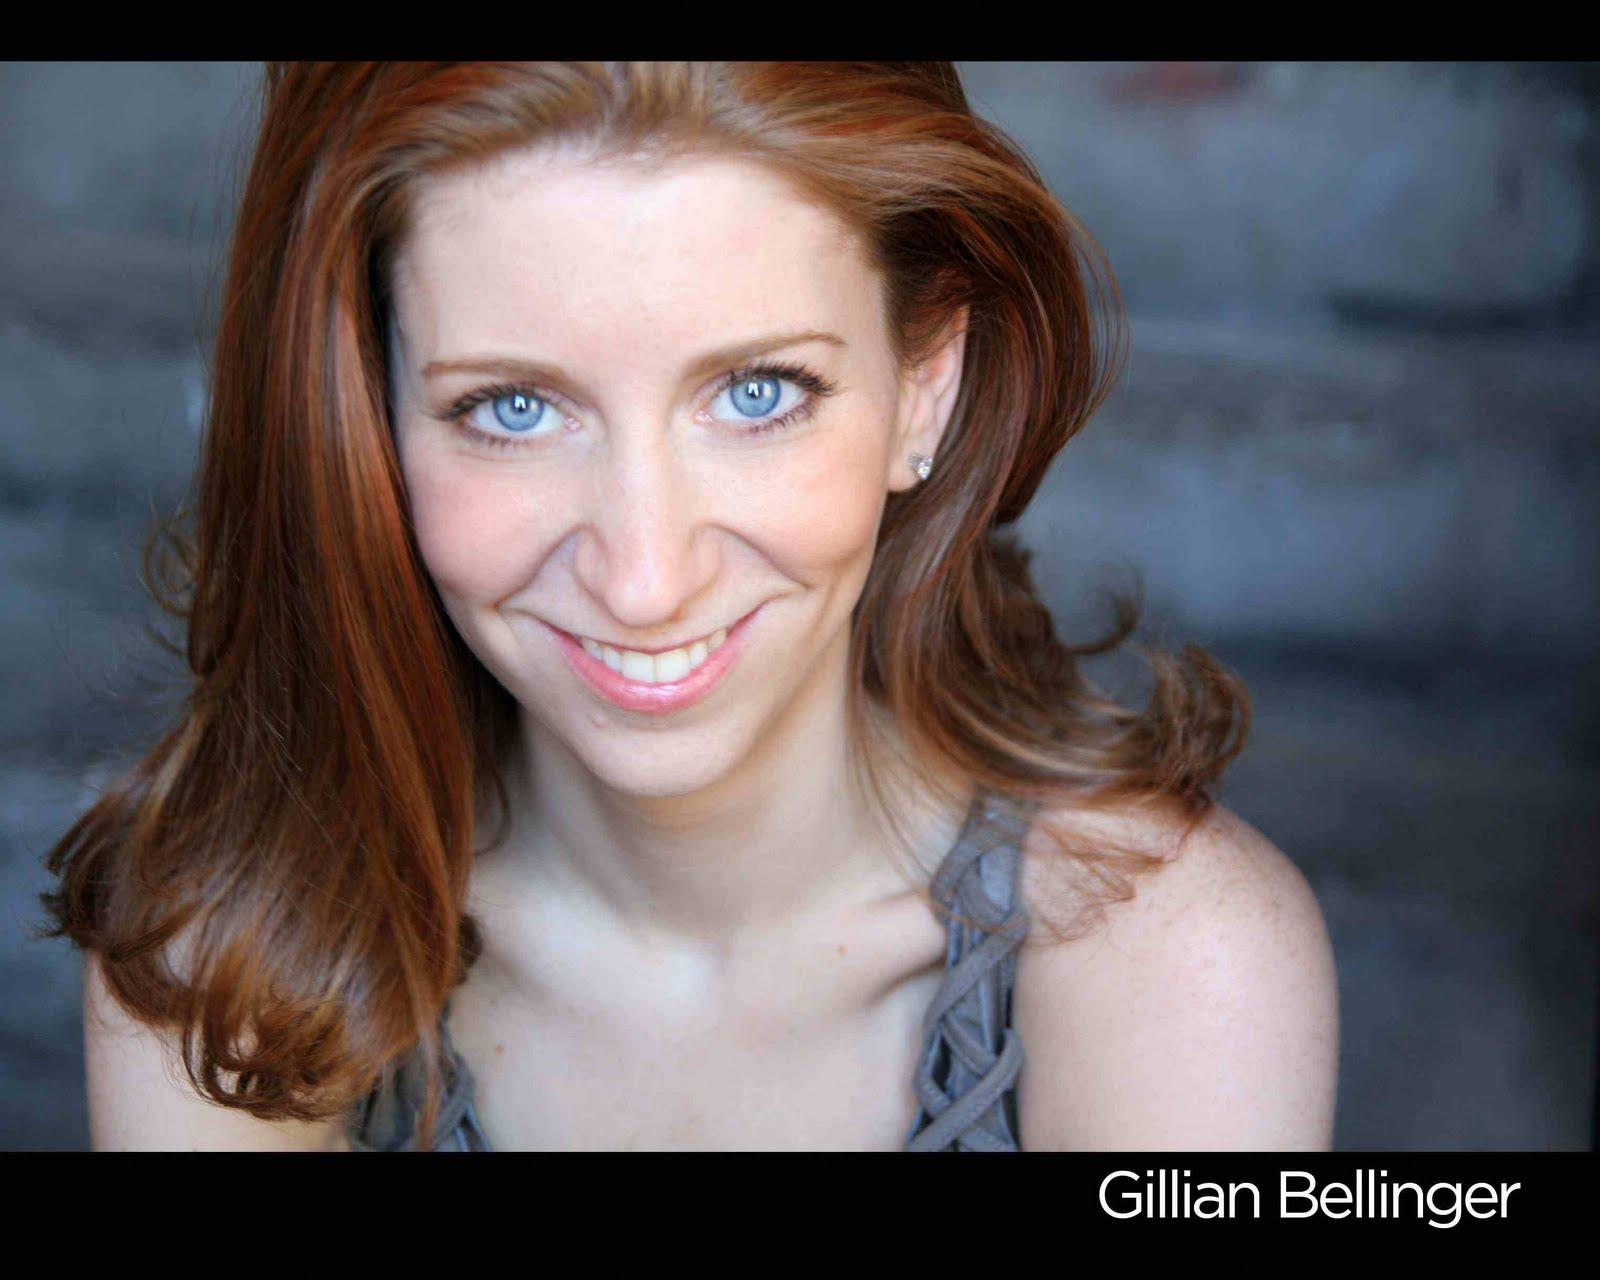 LTYM LA Cast: Gillian Bellinger   Listen To Your Mother